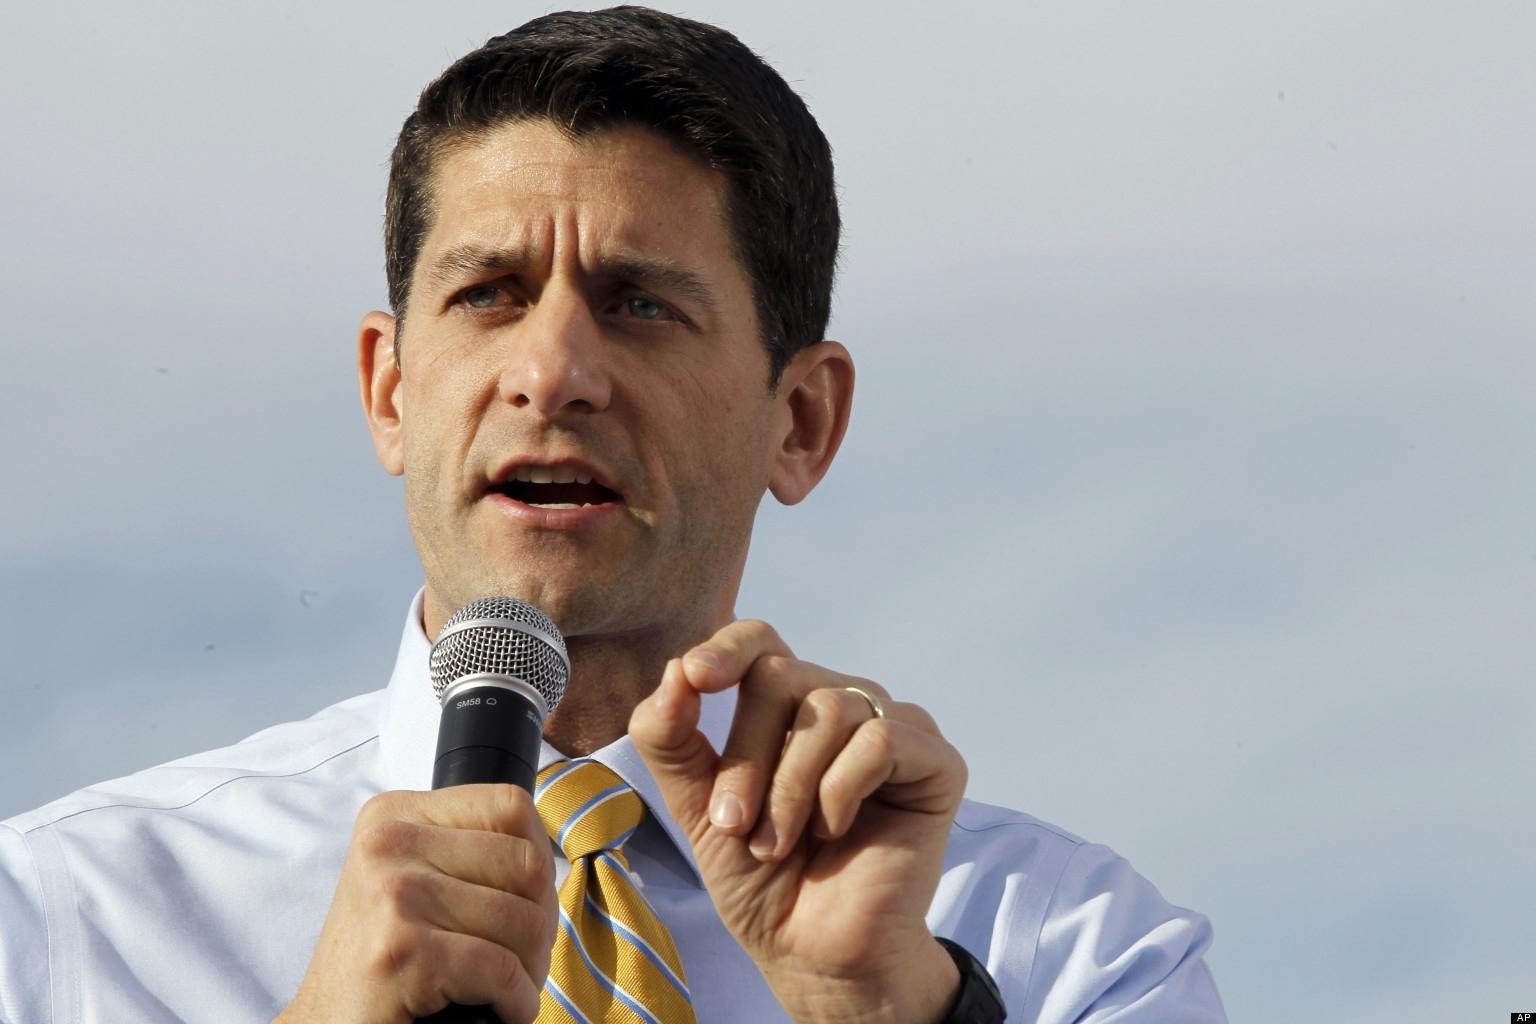 Paul Ryan Makes An A$$ of Himself Again